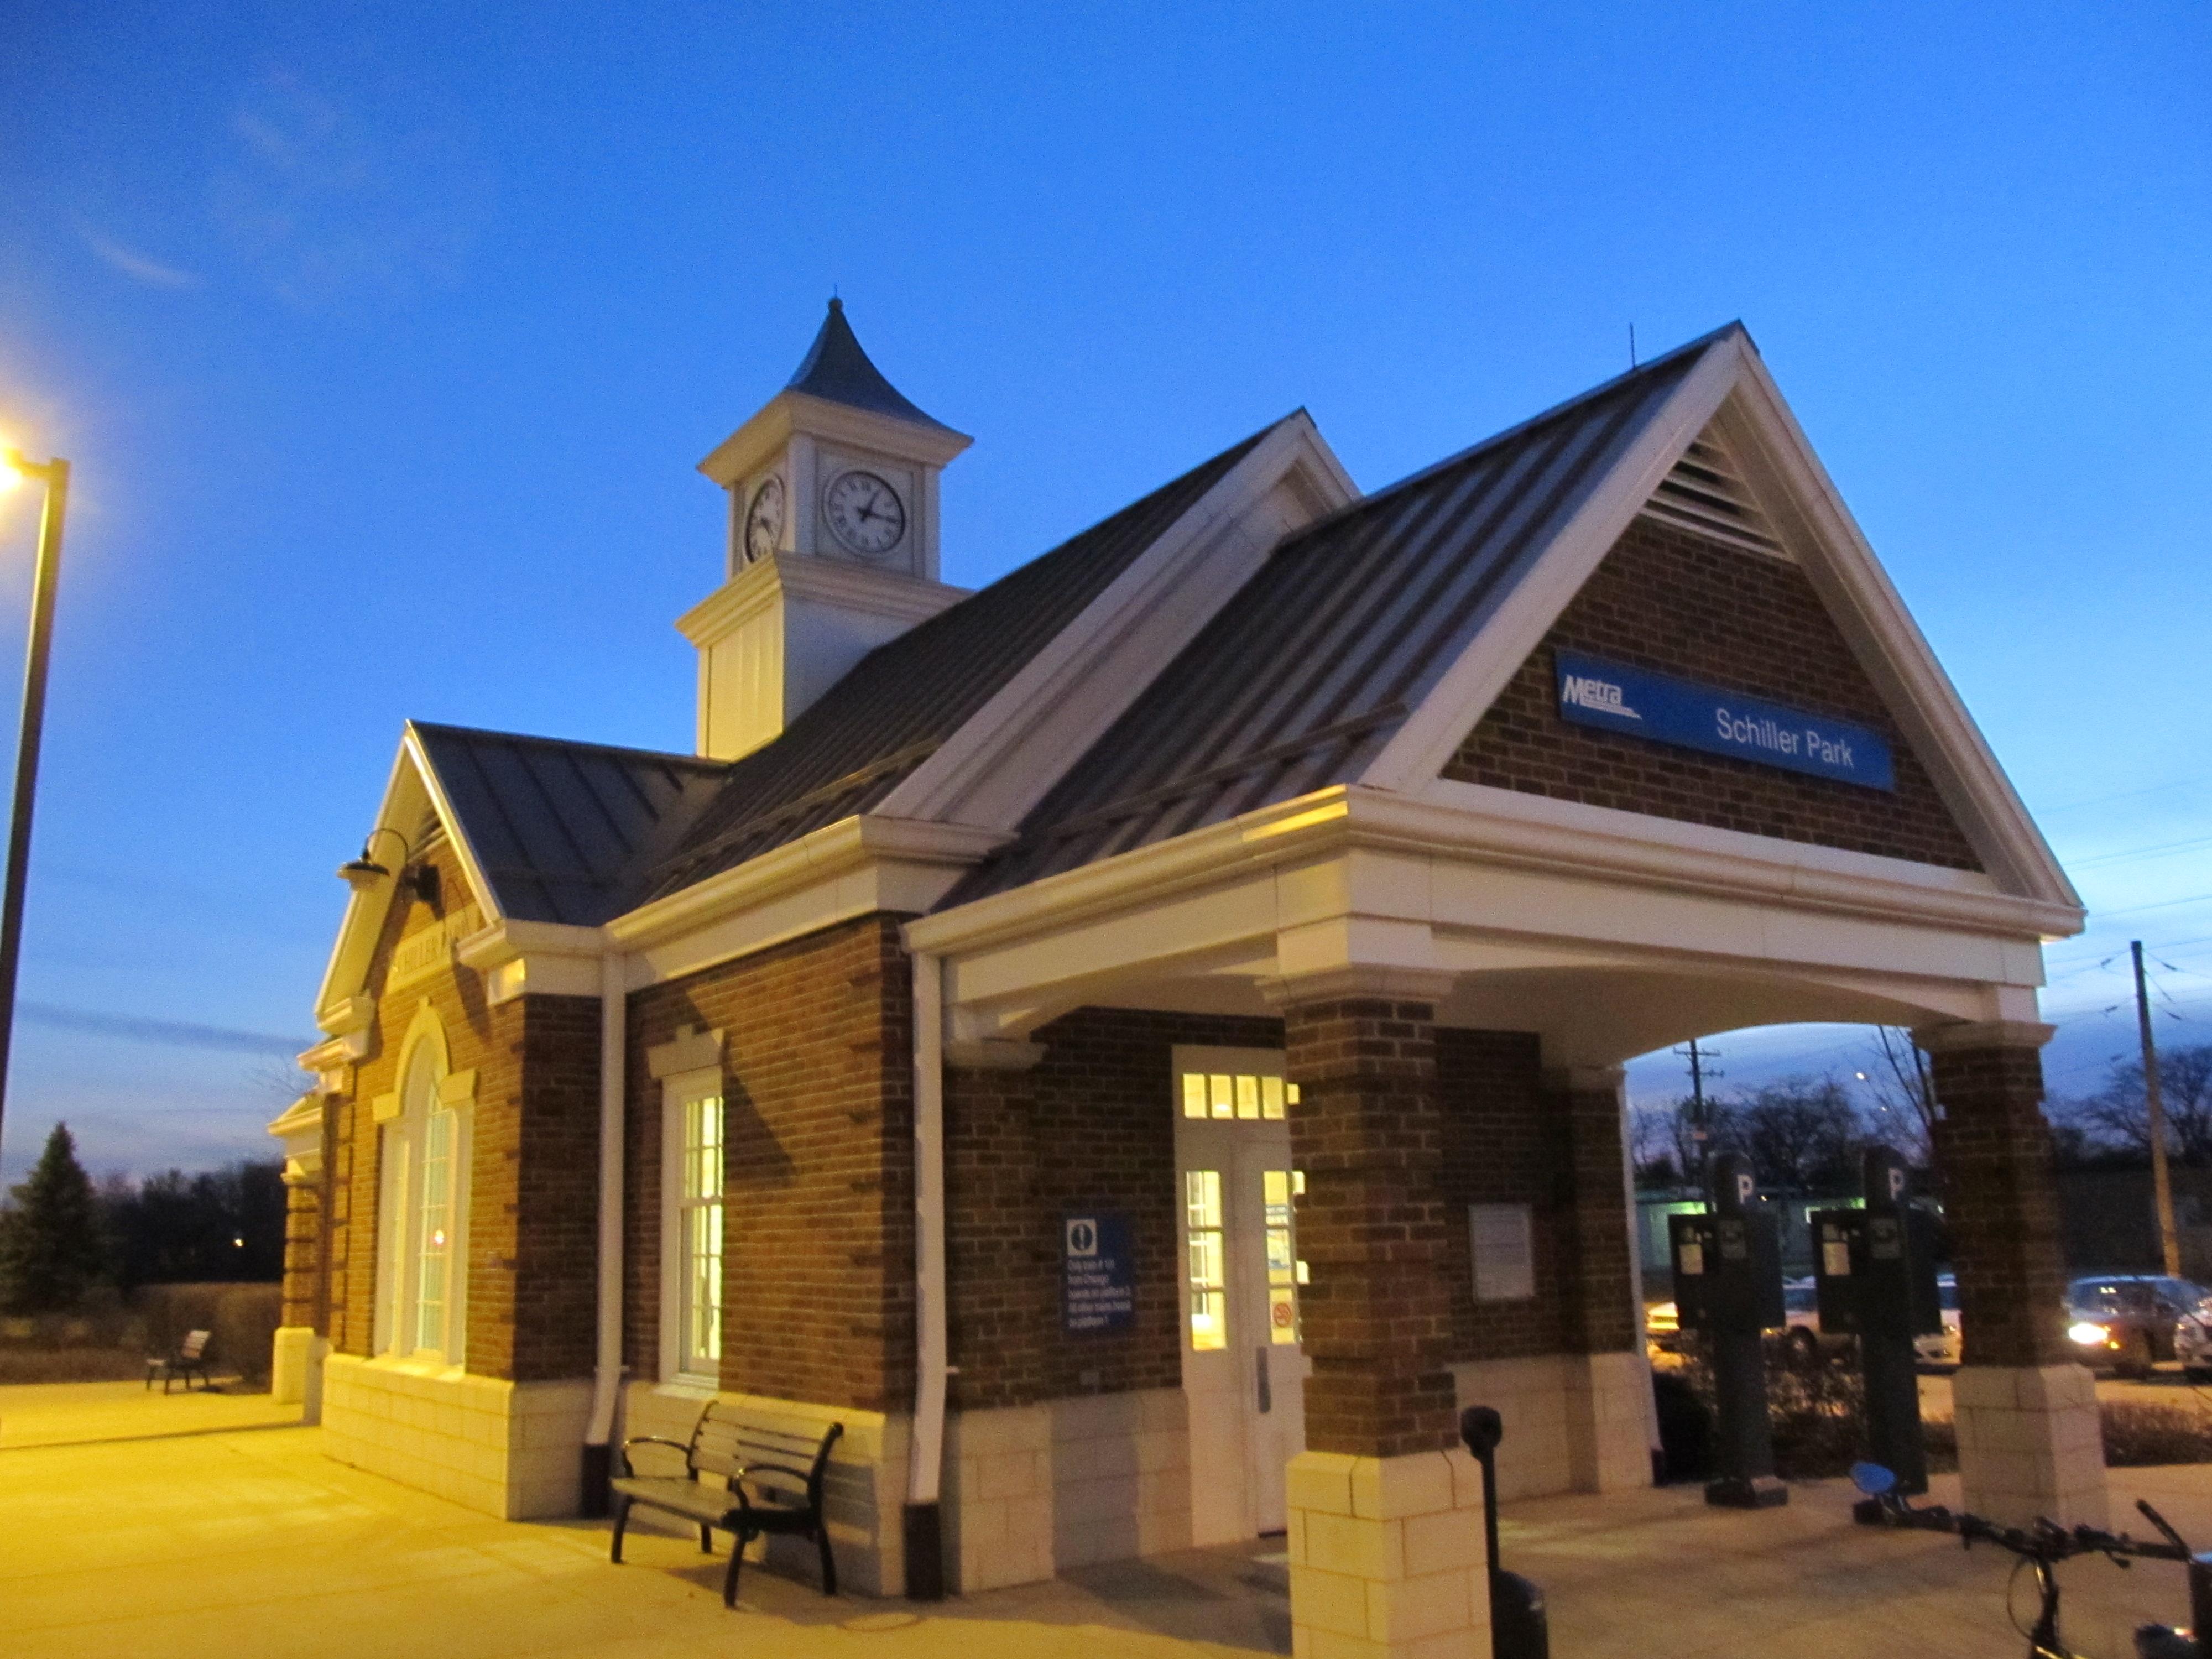 Http Www Chicagoparkdistrict Com Parks North Park Village Nature Center